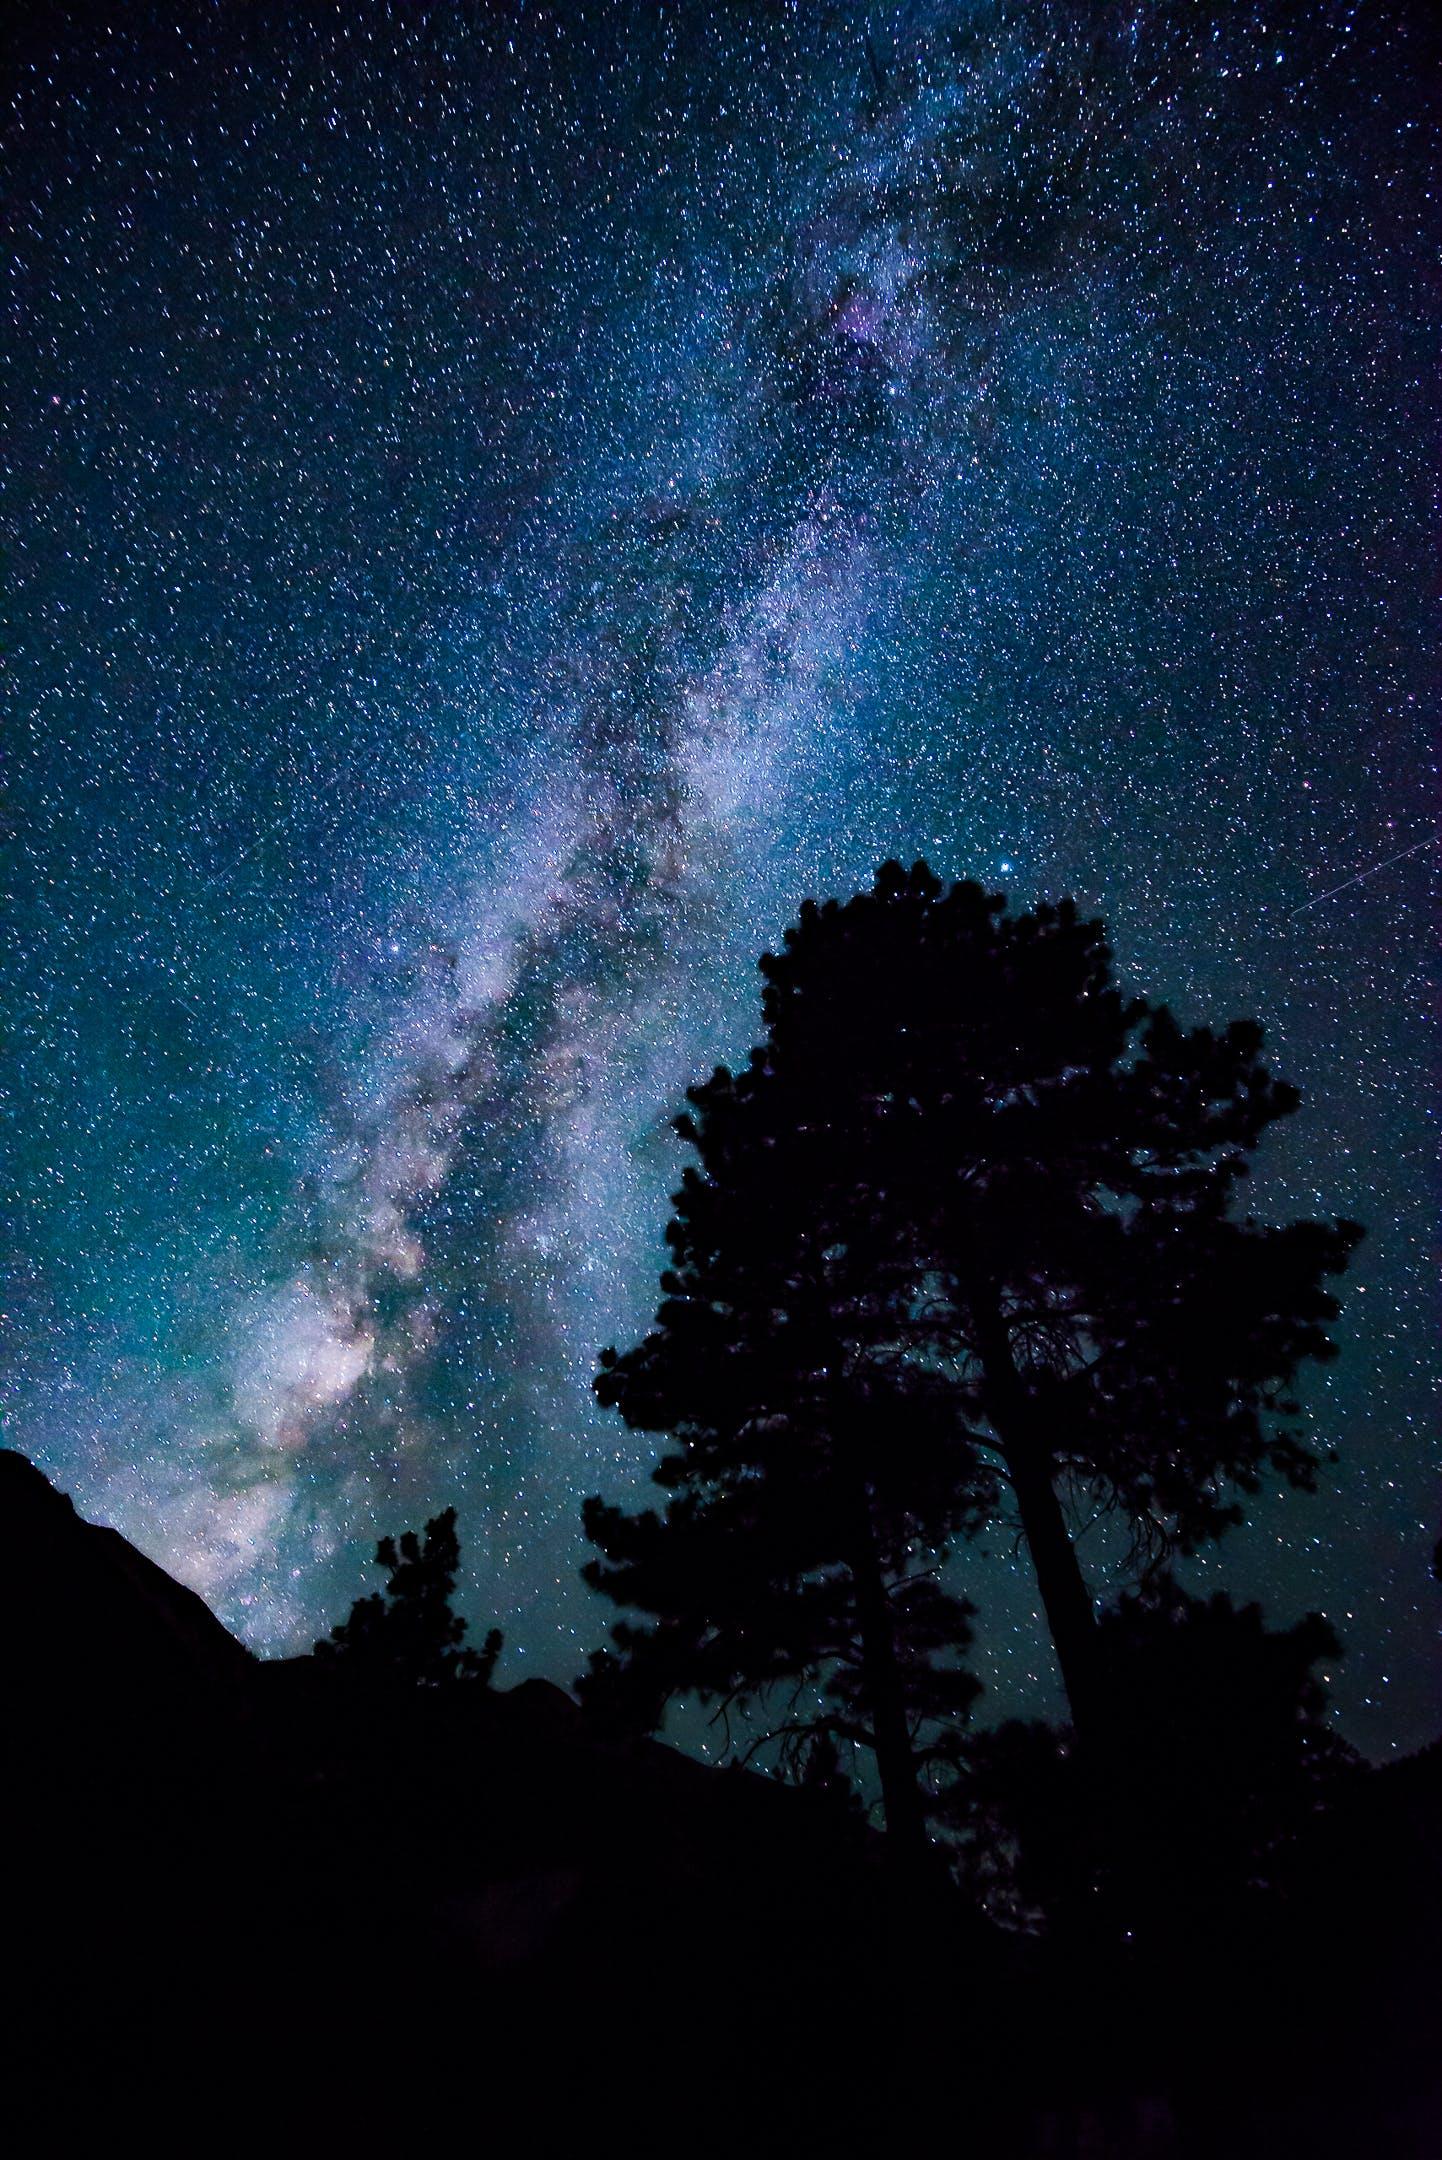 Low-angle Photograph of Stars